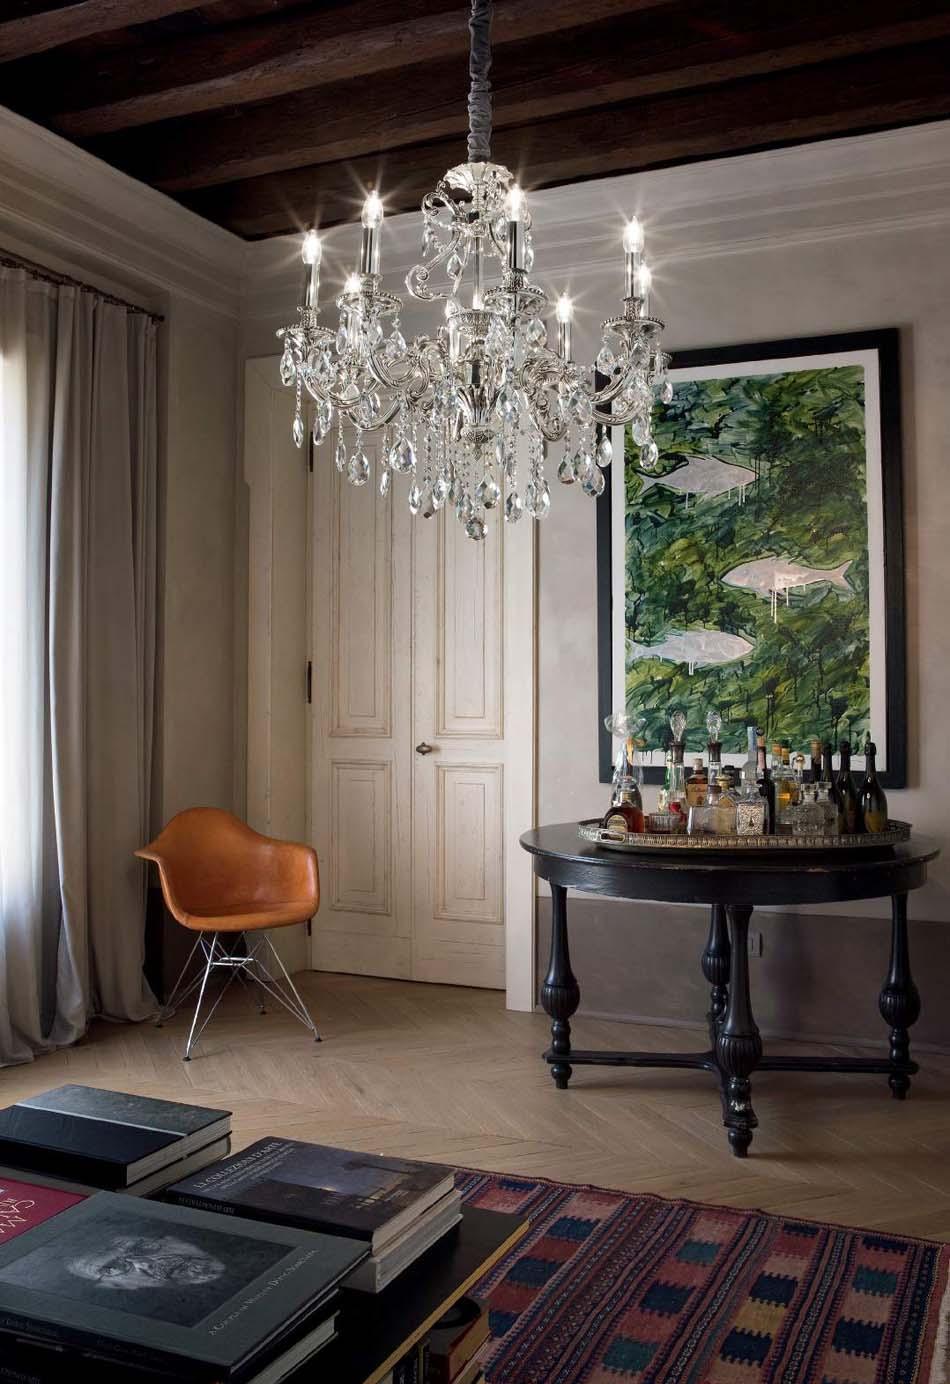 Lampade 24 sospese vintage Ideal Lux Gioconda – Toscana Arredamenti